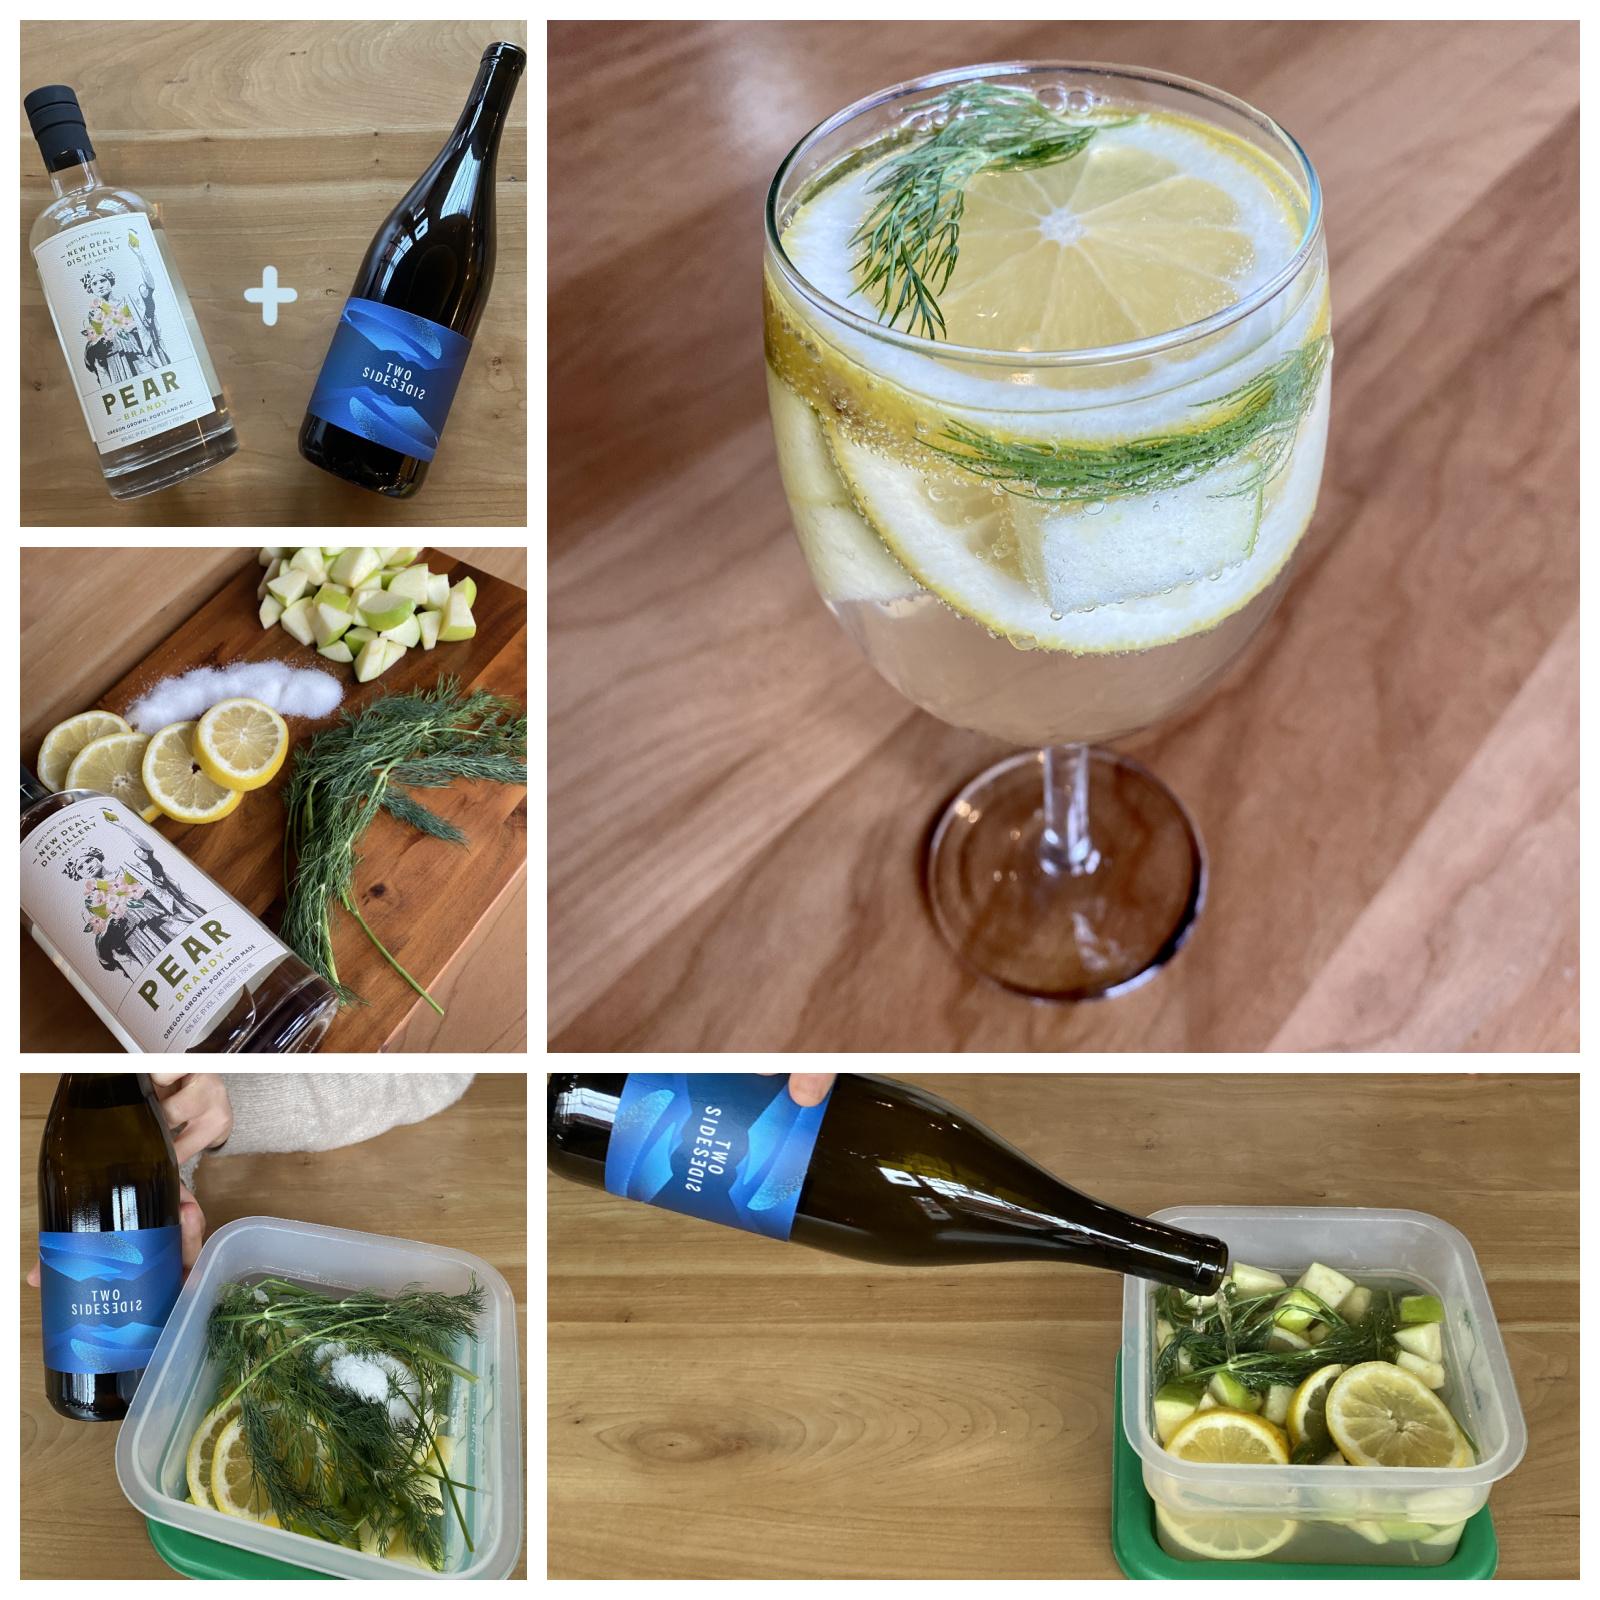 New Deal White Wine & Pear Brandy Sangria Recipe